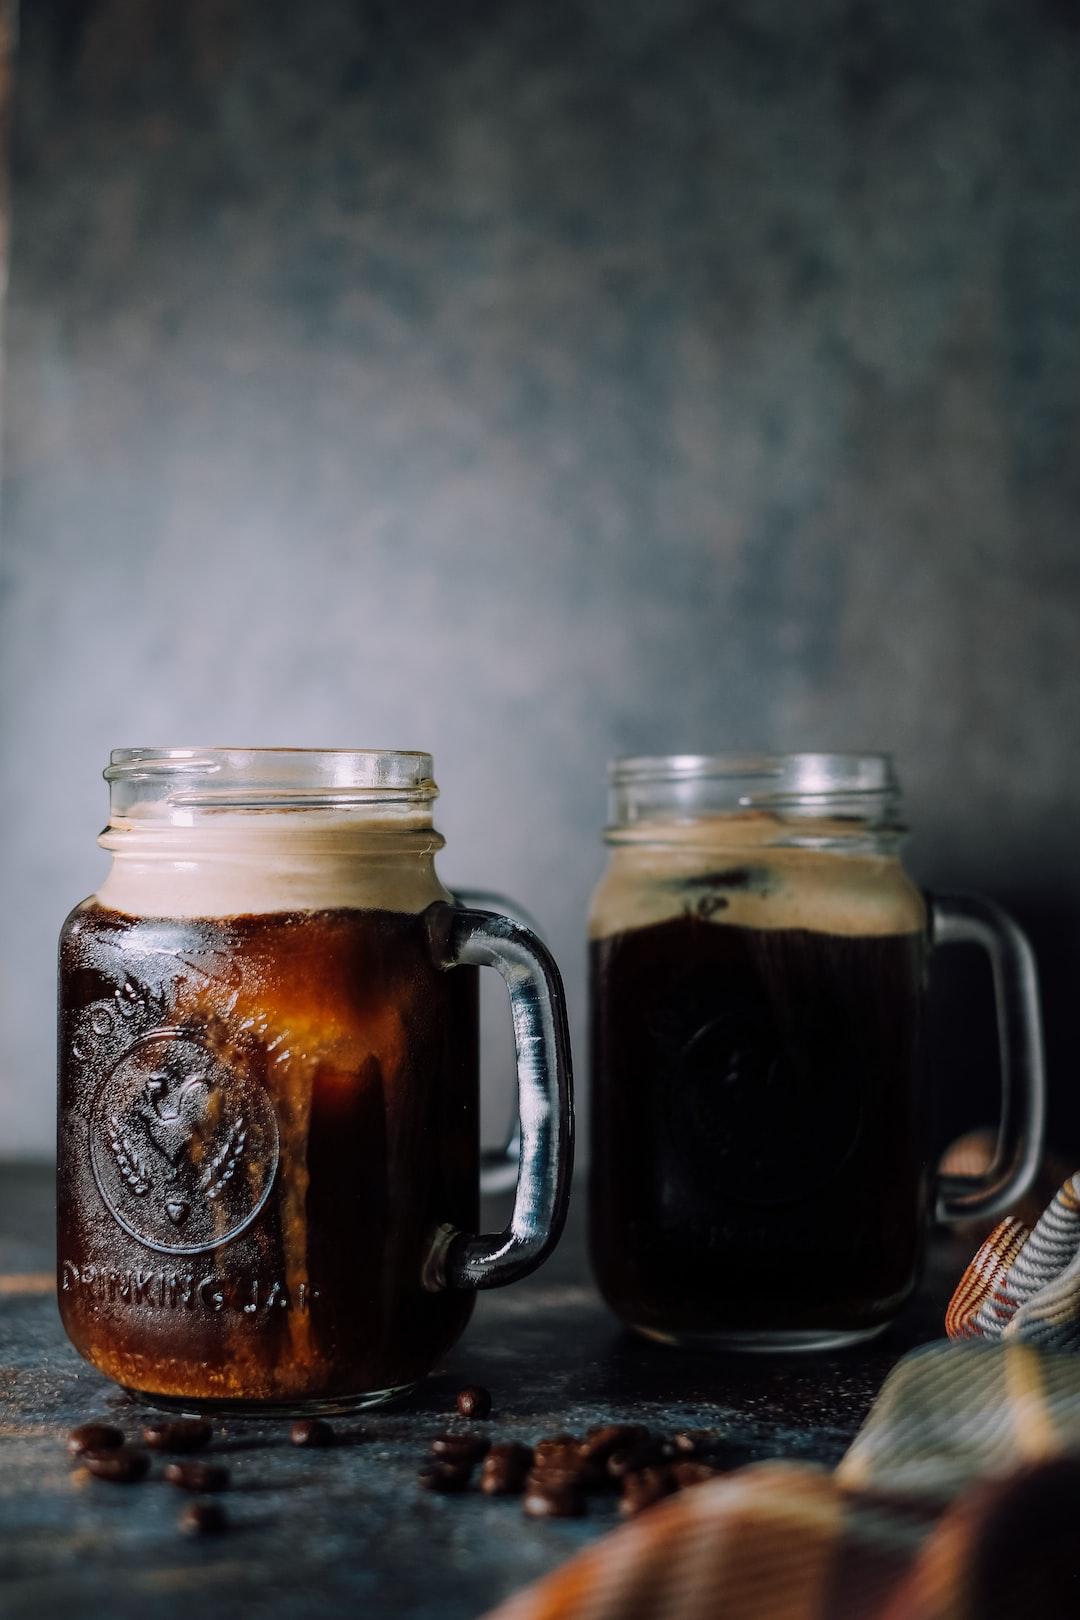 Pumpkin Cream Cold Brew Coffee into Glass Rustic Earthy Background